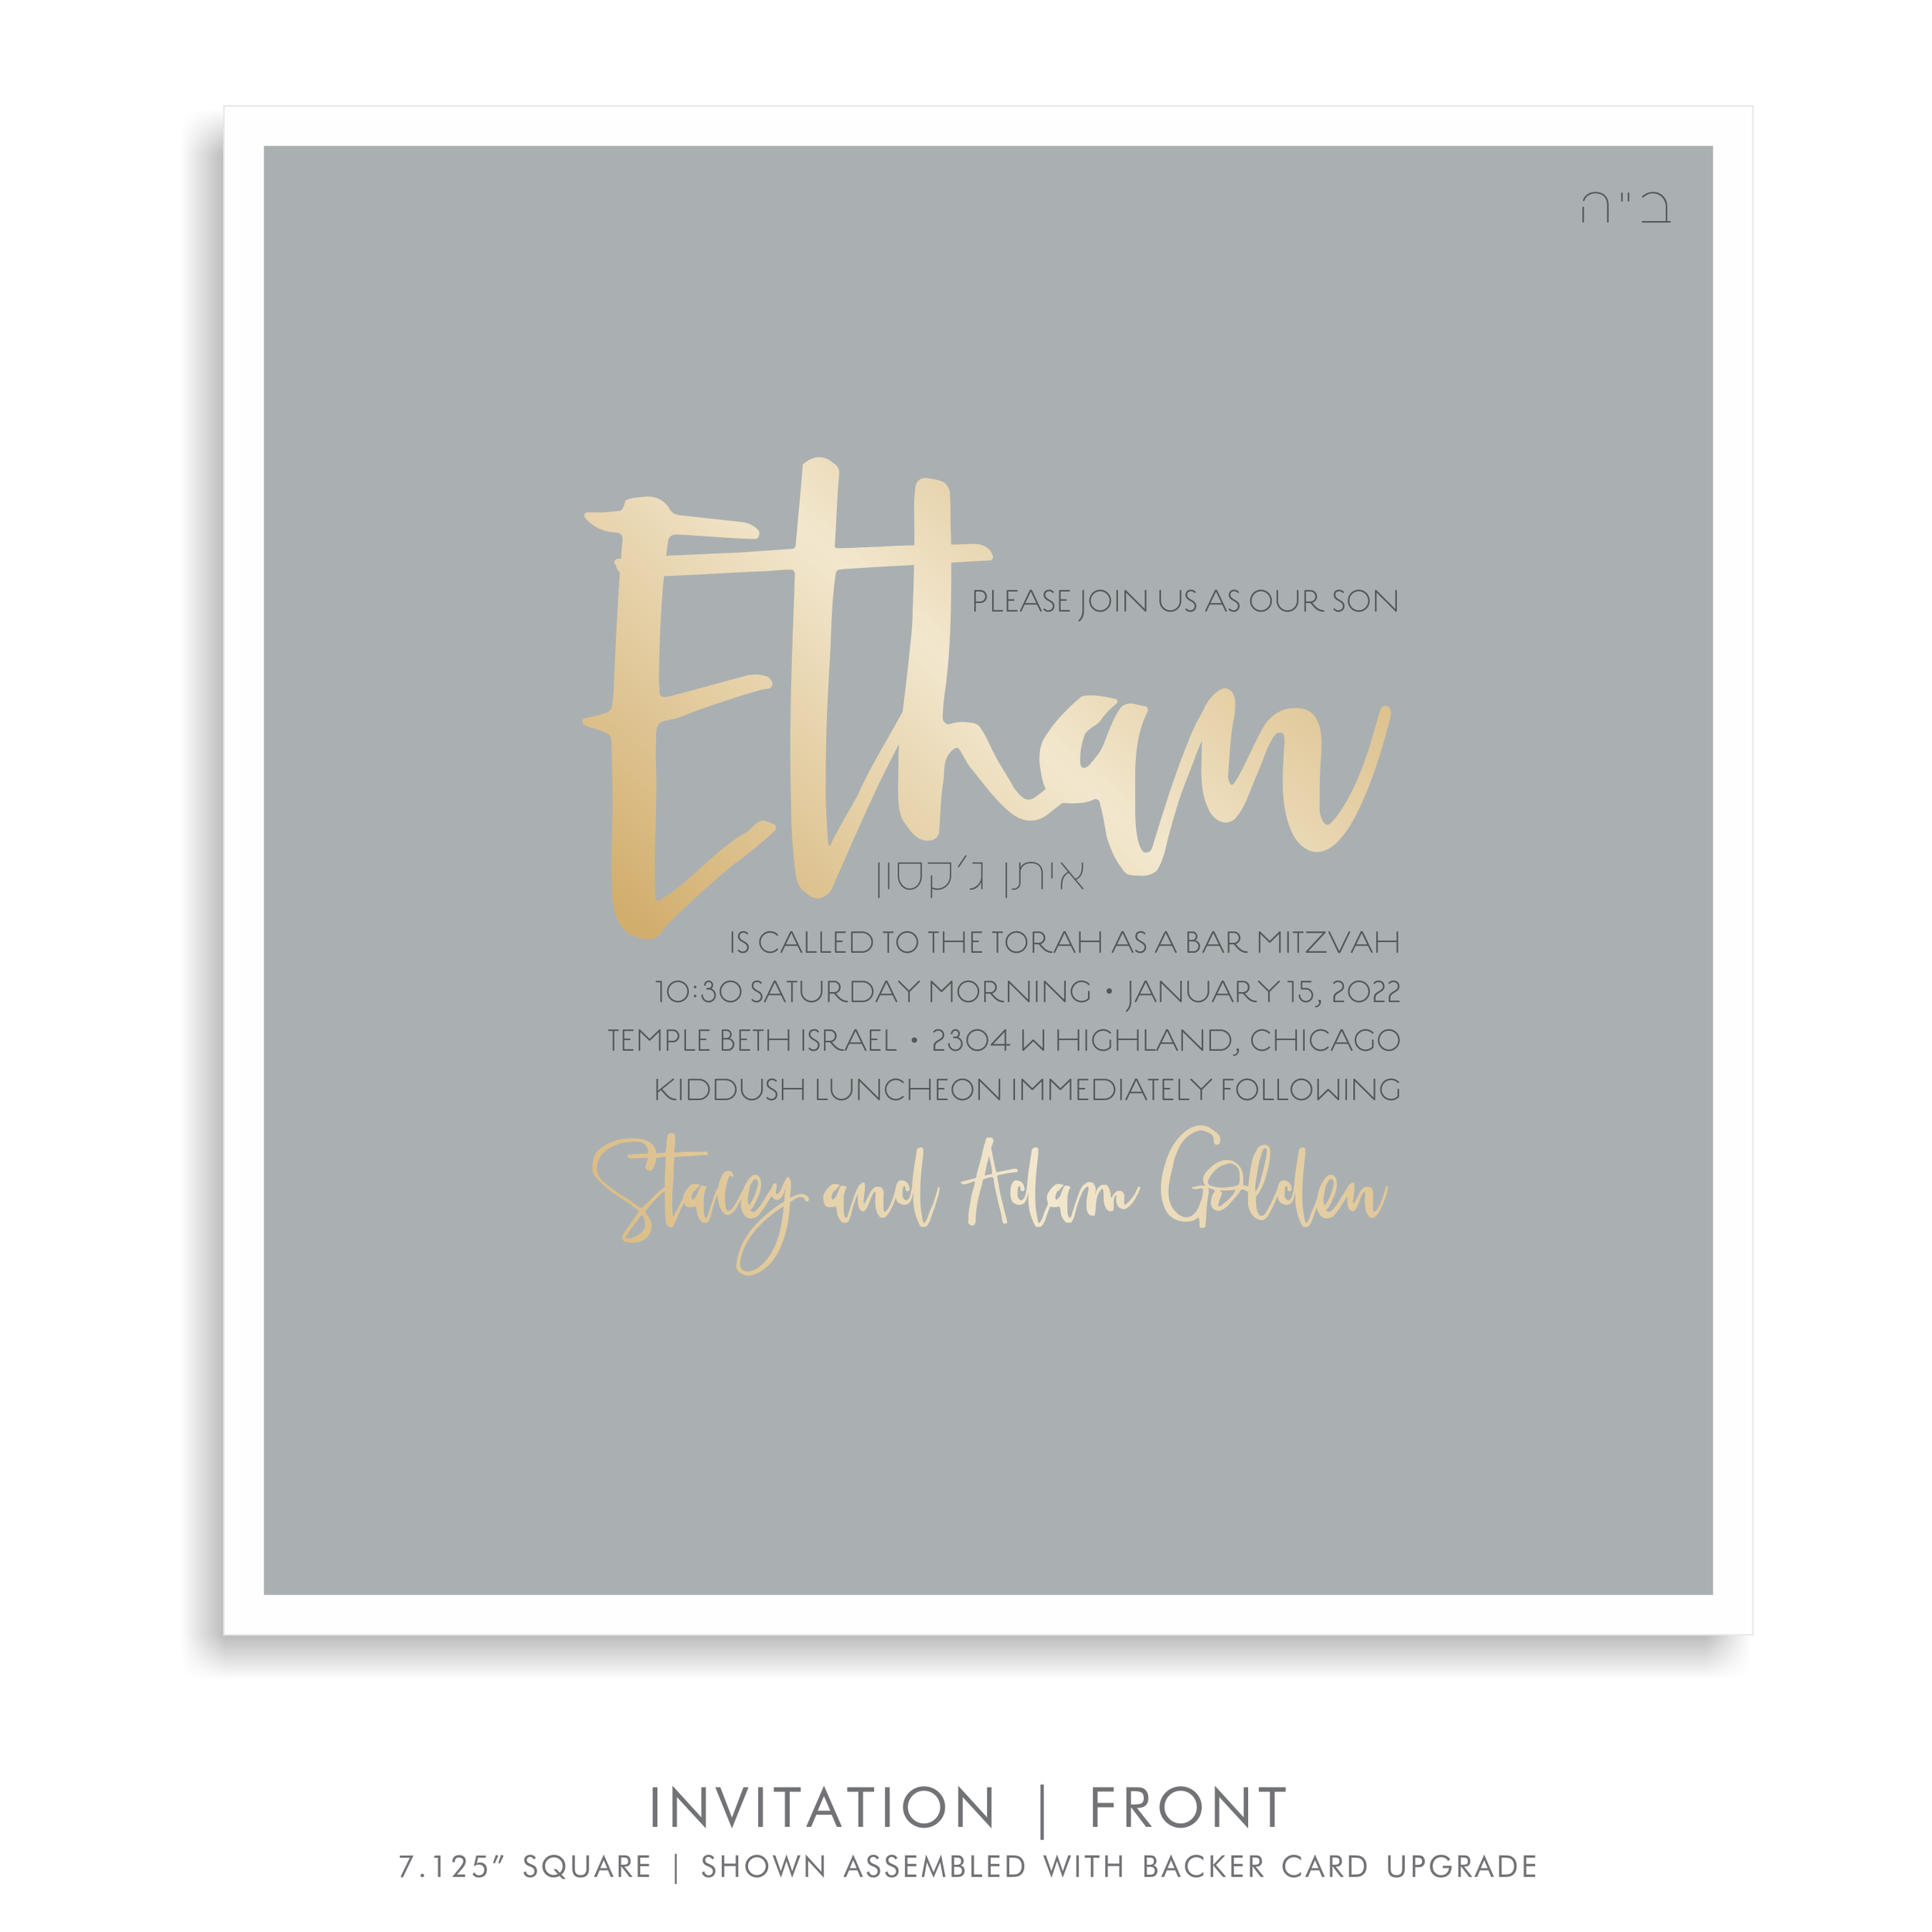 http://www.sarahschwartz.com/bar-mitzvah-invitations-5401-1